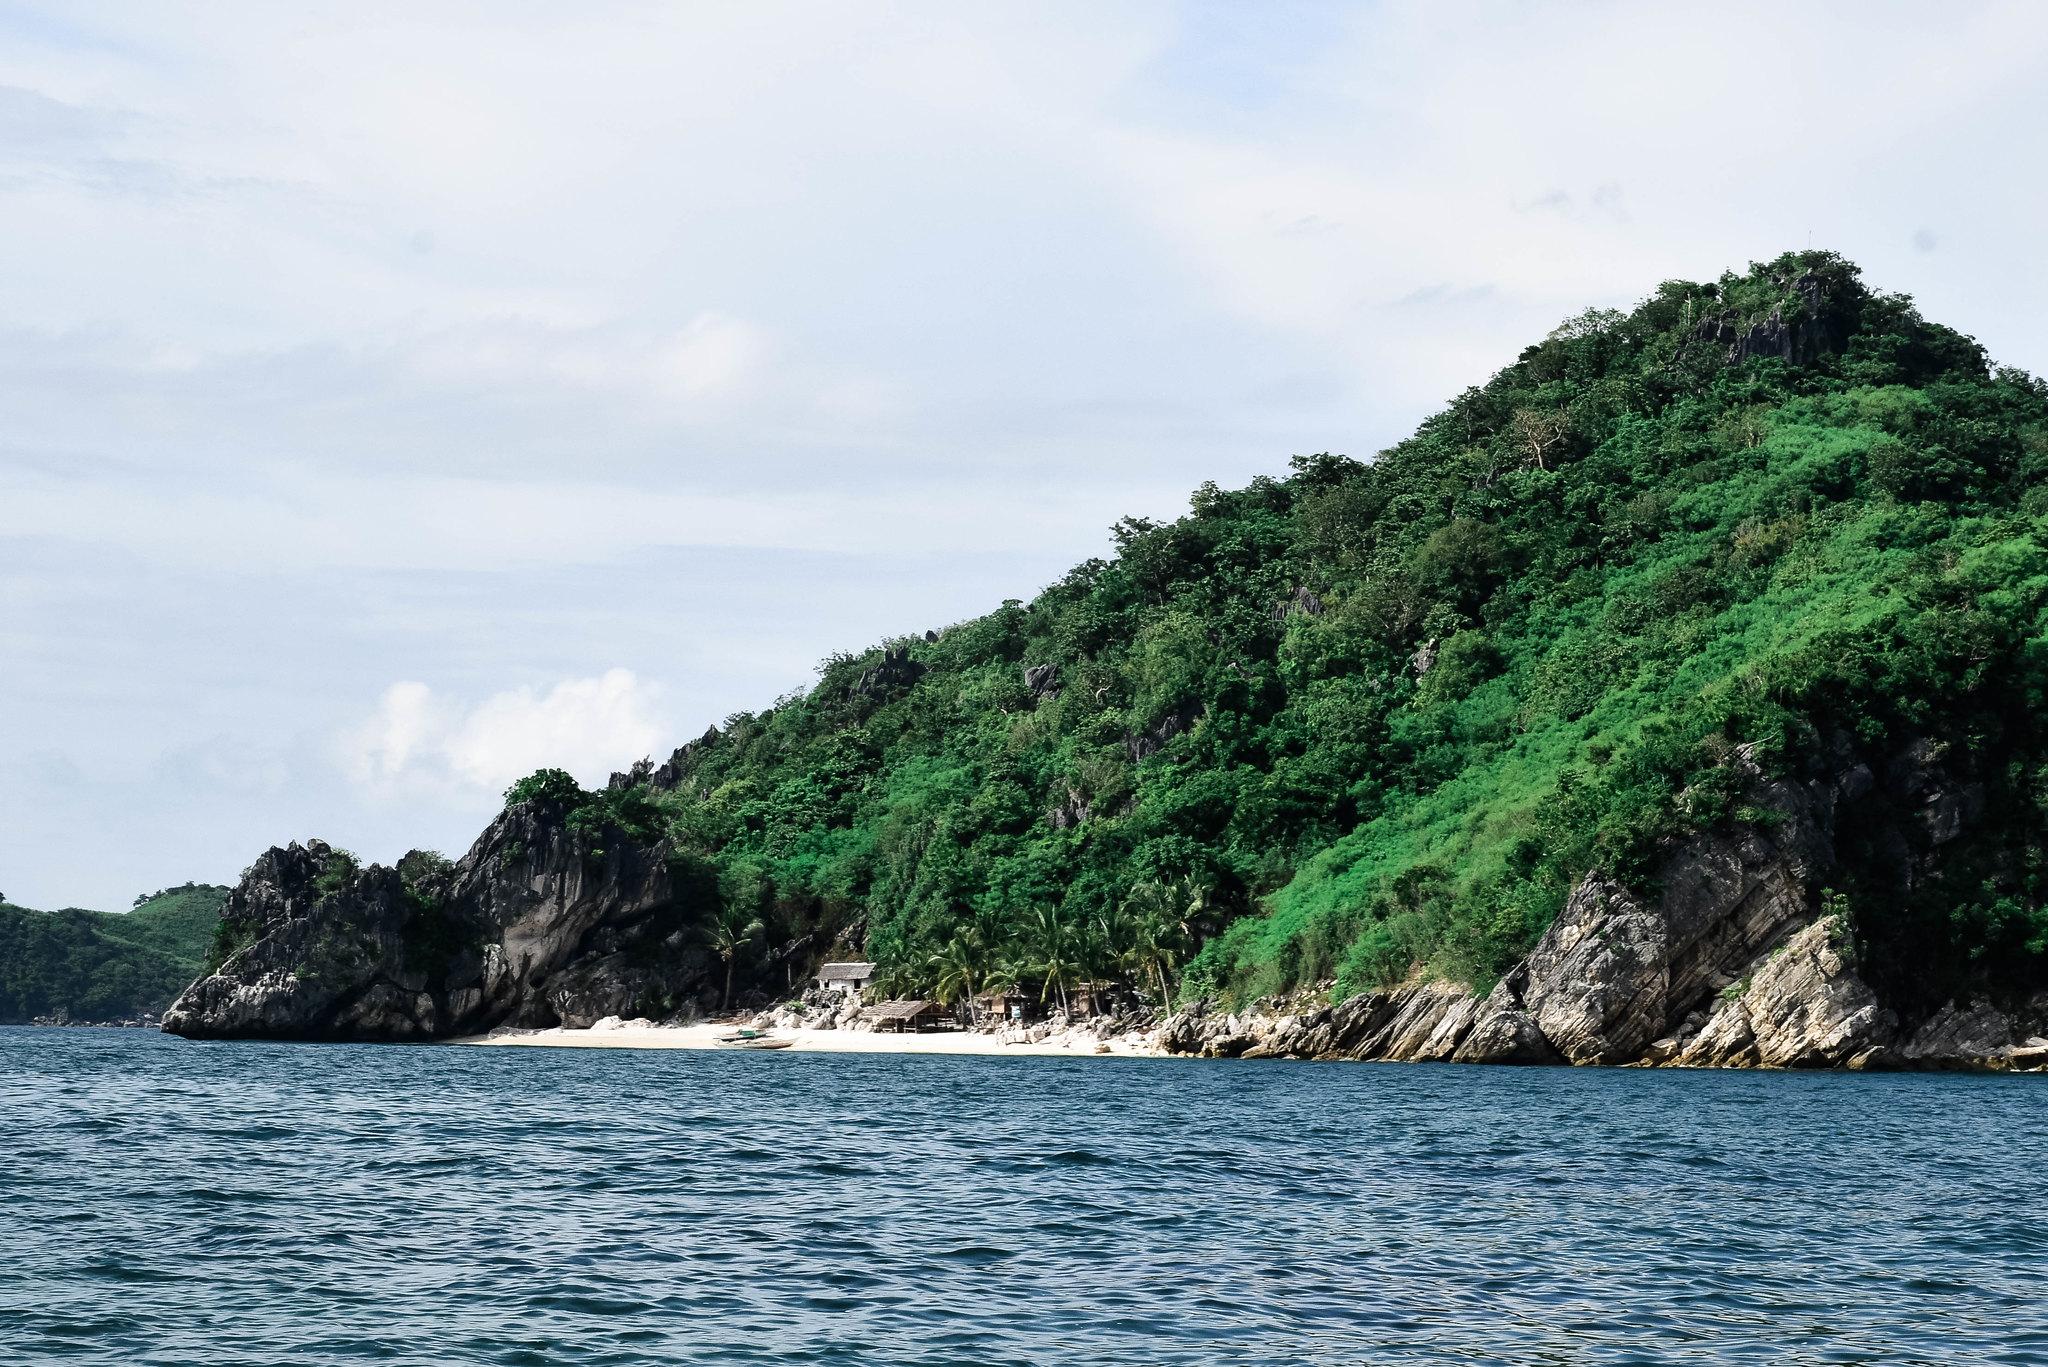 Cabugaw Gamay island 6 (1 of 1)